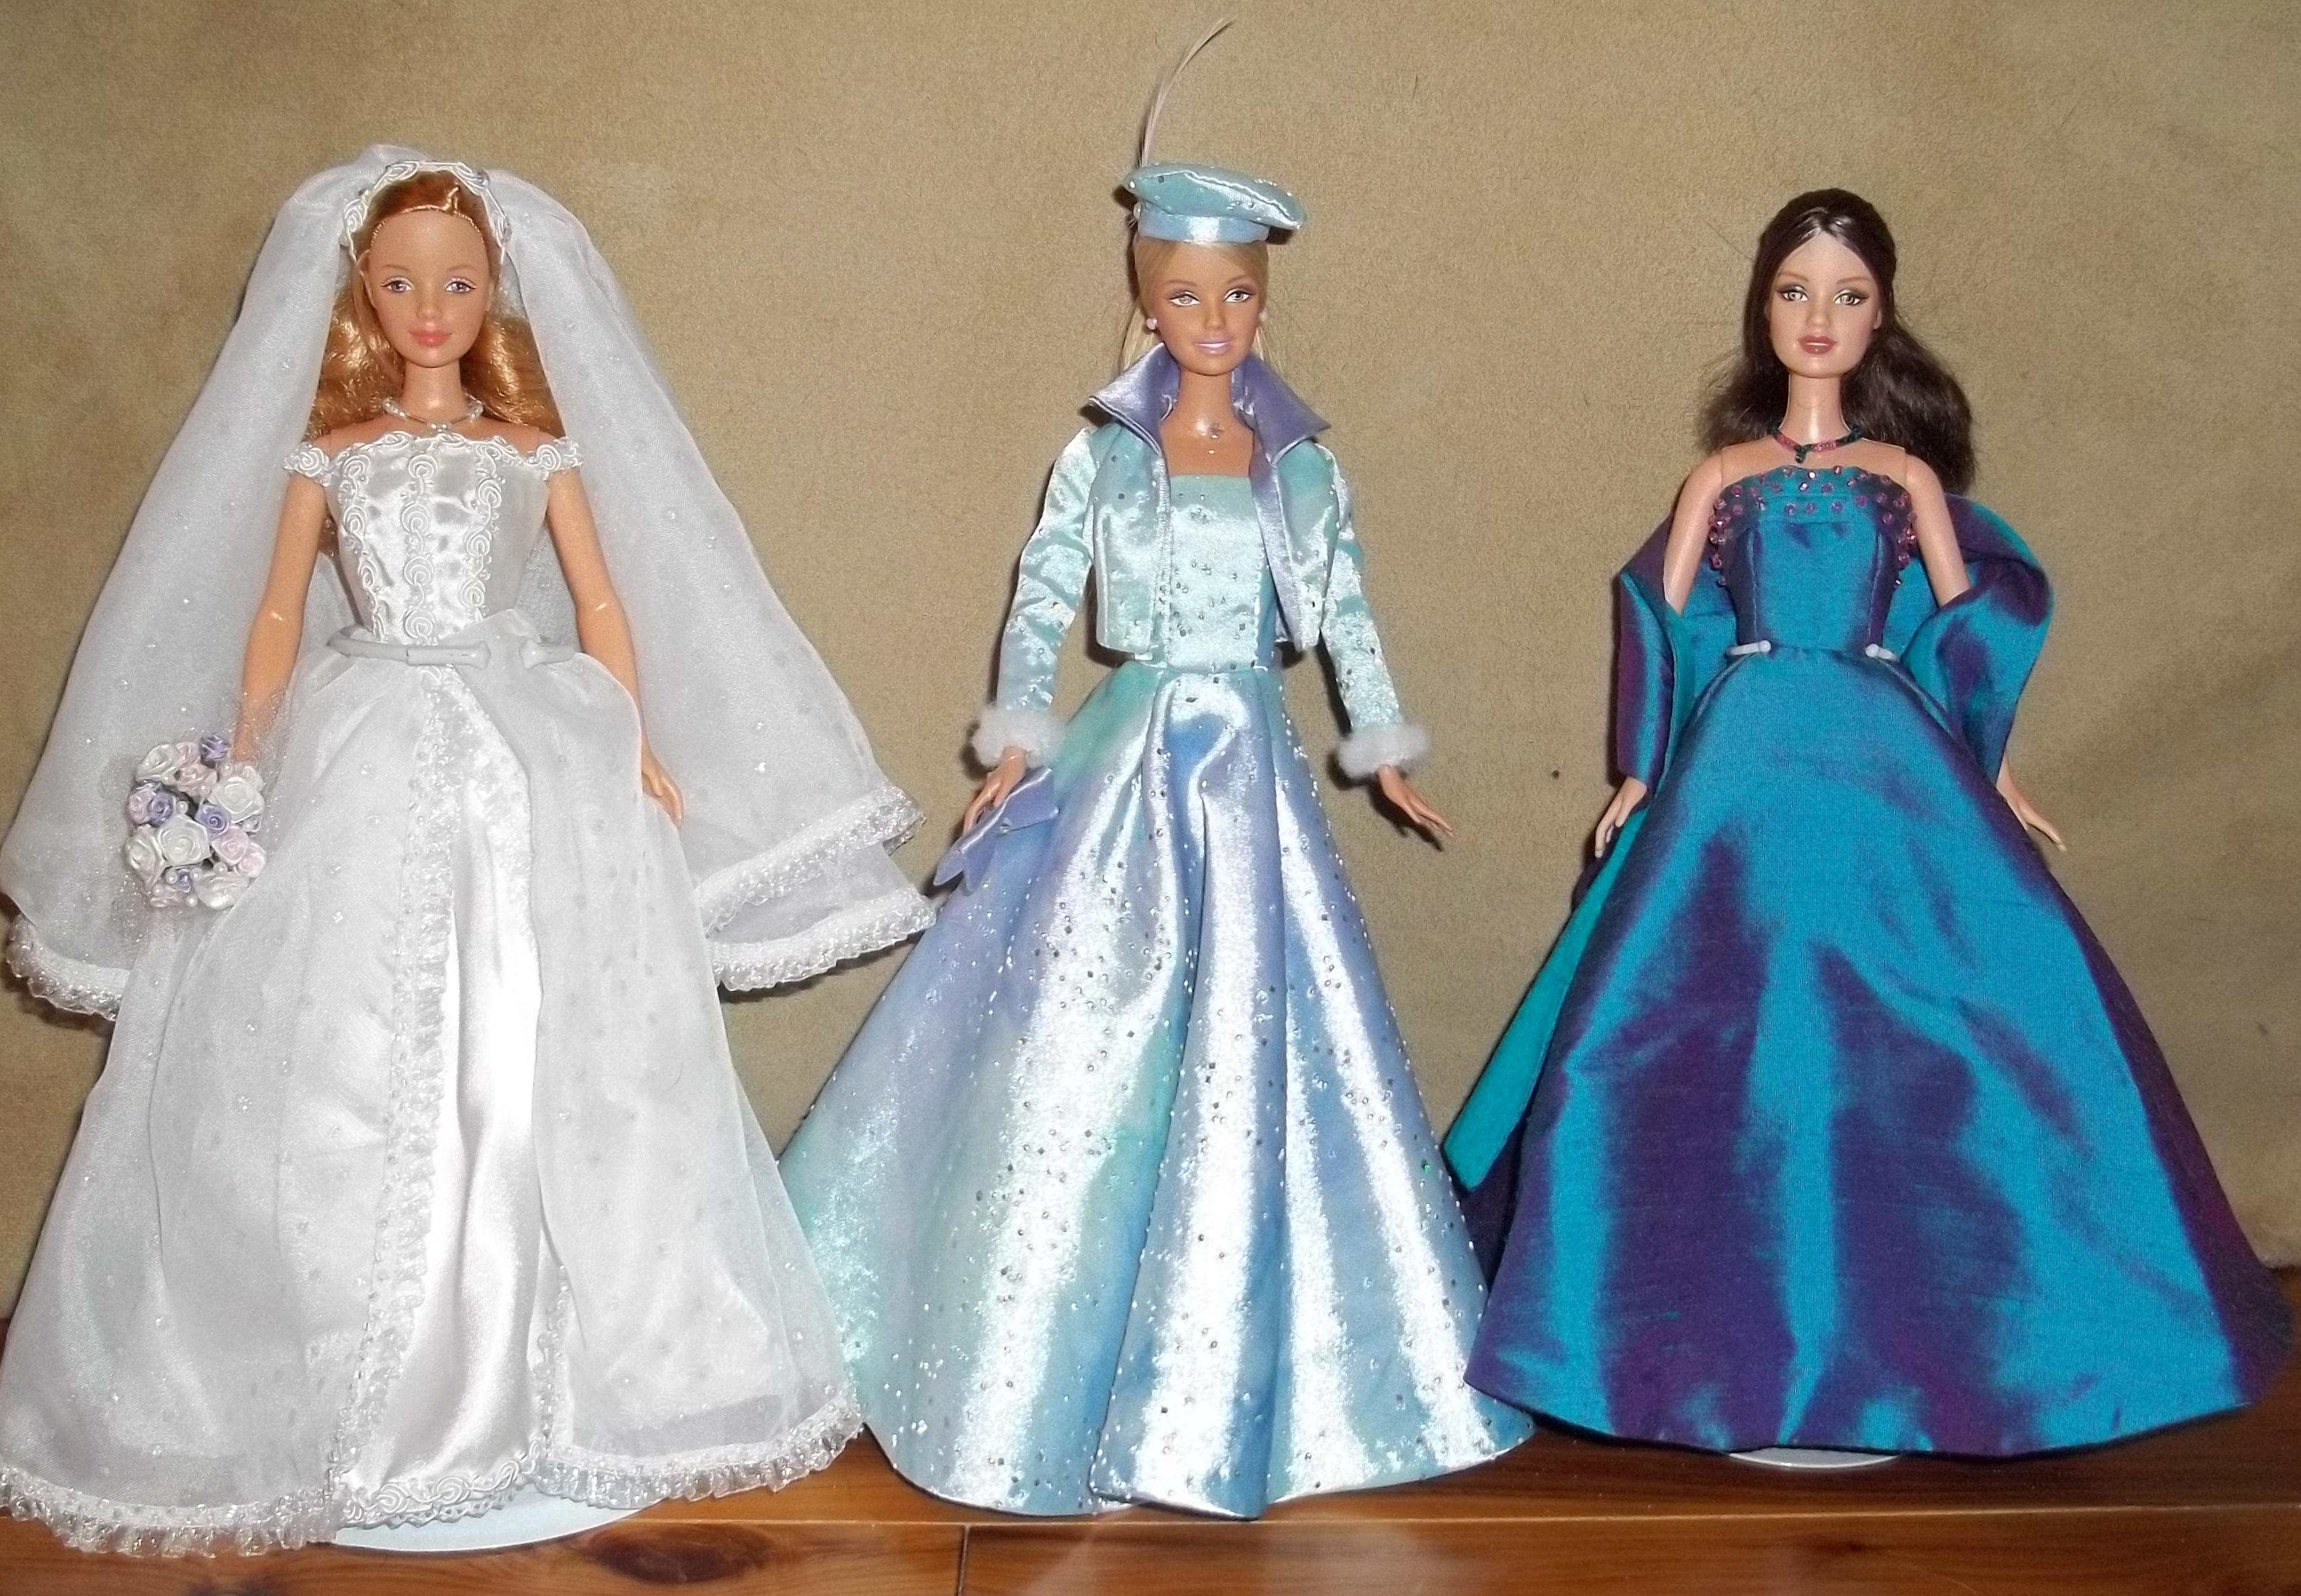 barbie clothes – C.B. Wentworth